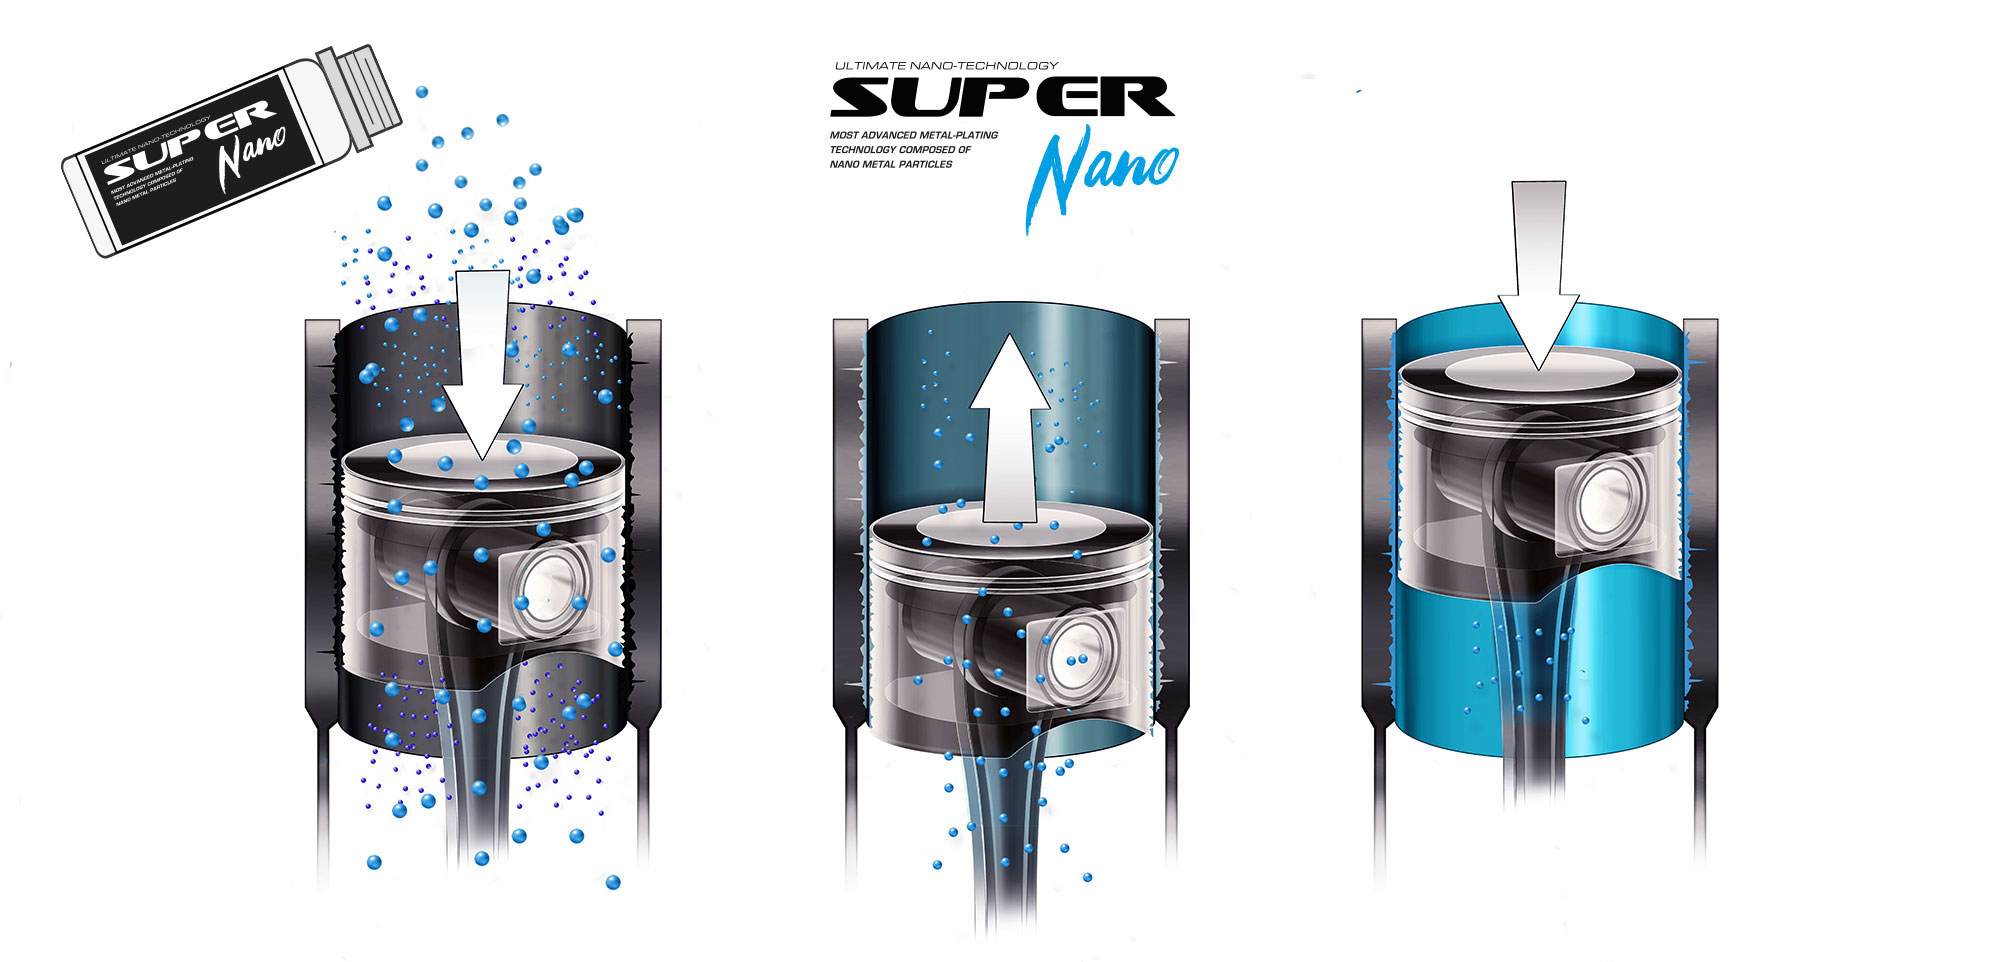 Super nano remetaliser how it works graphic